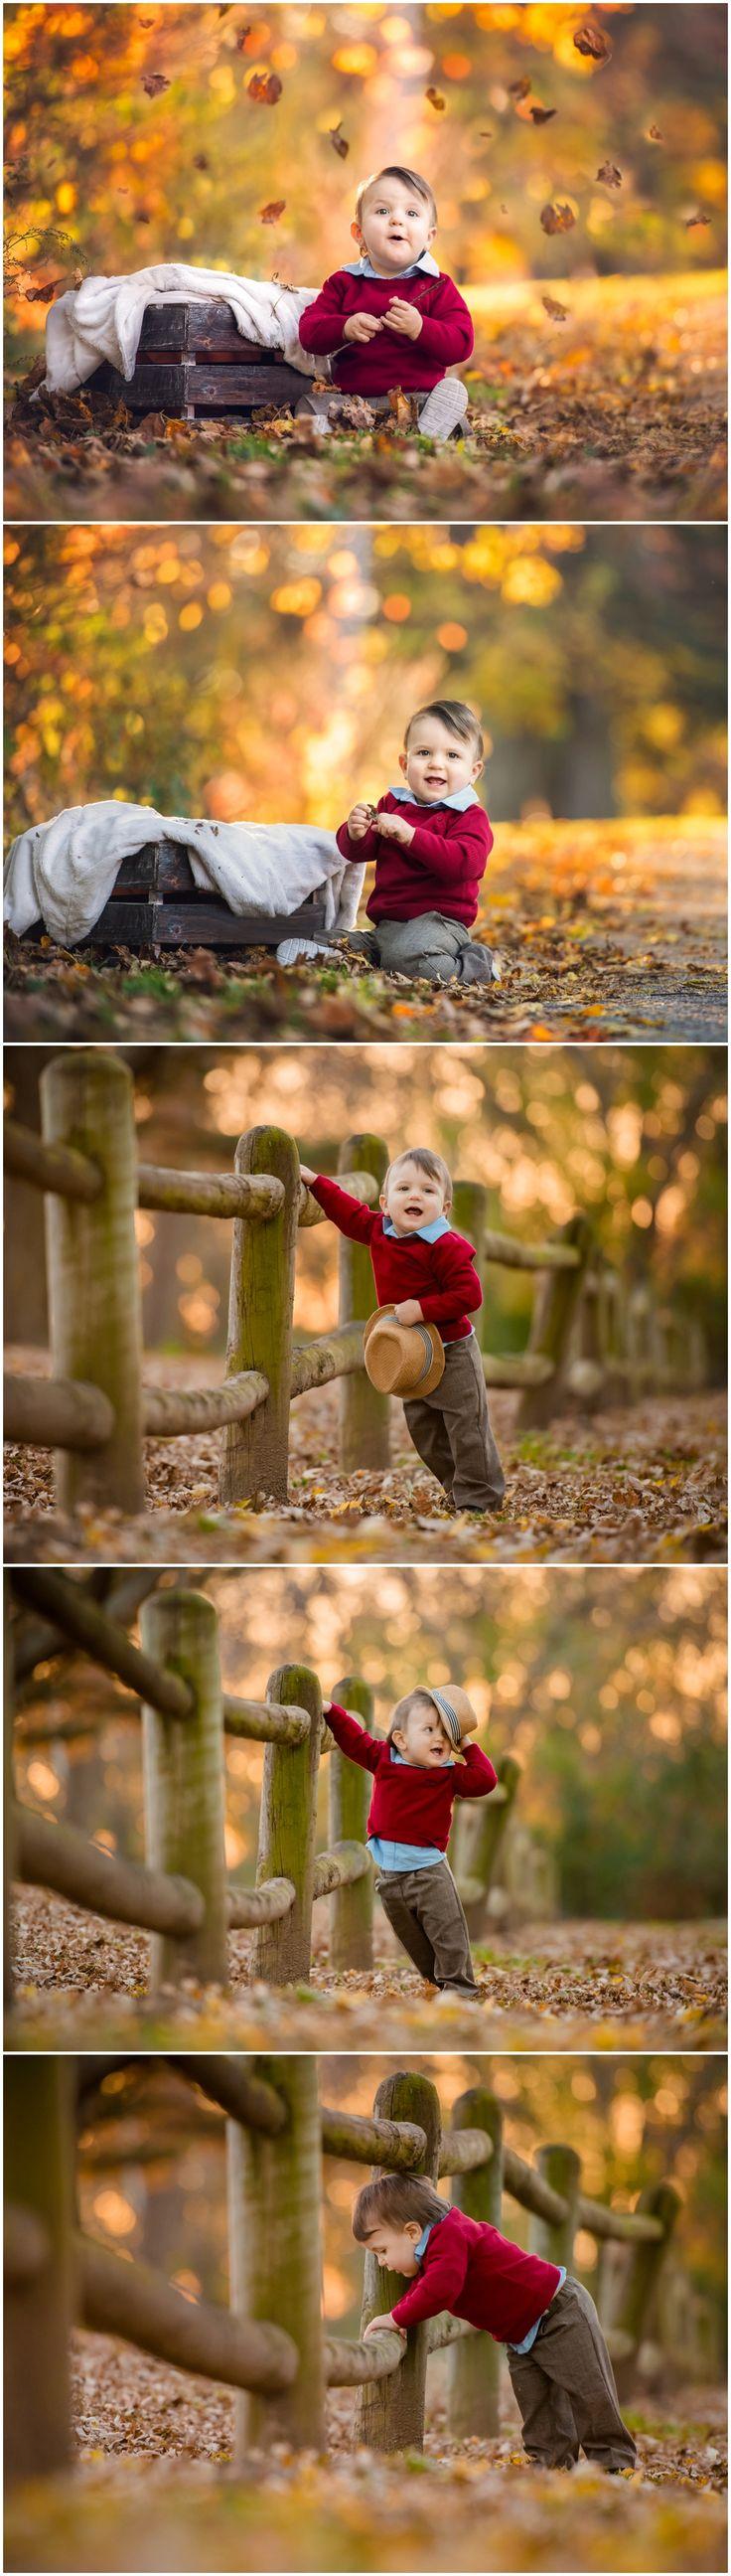 First birthday photoshoot ideas   vanessa smith photography   st louis child photographer